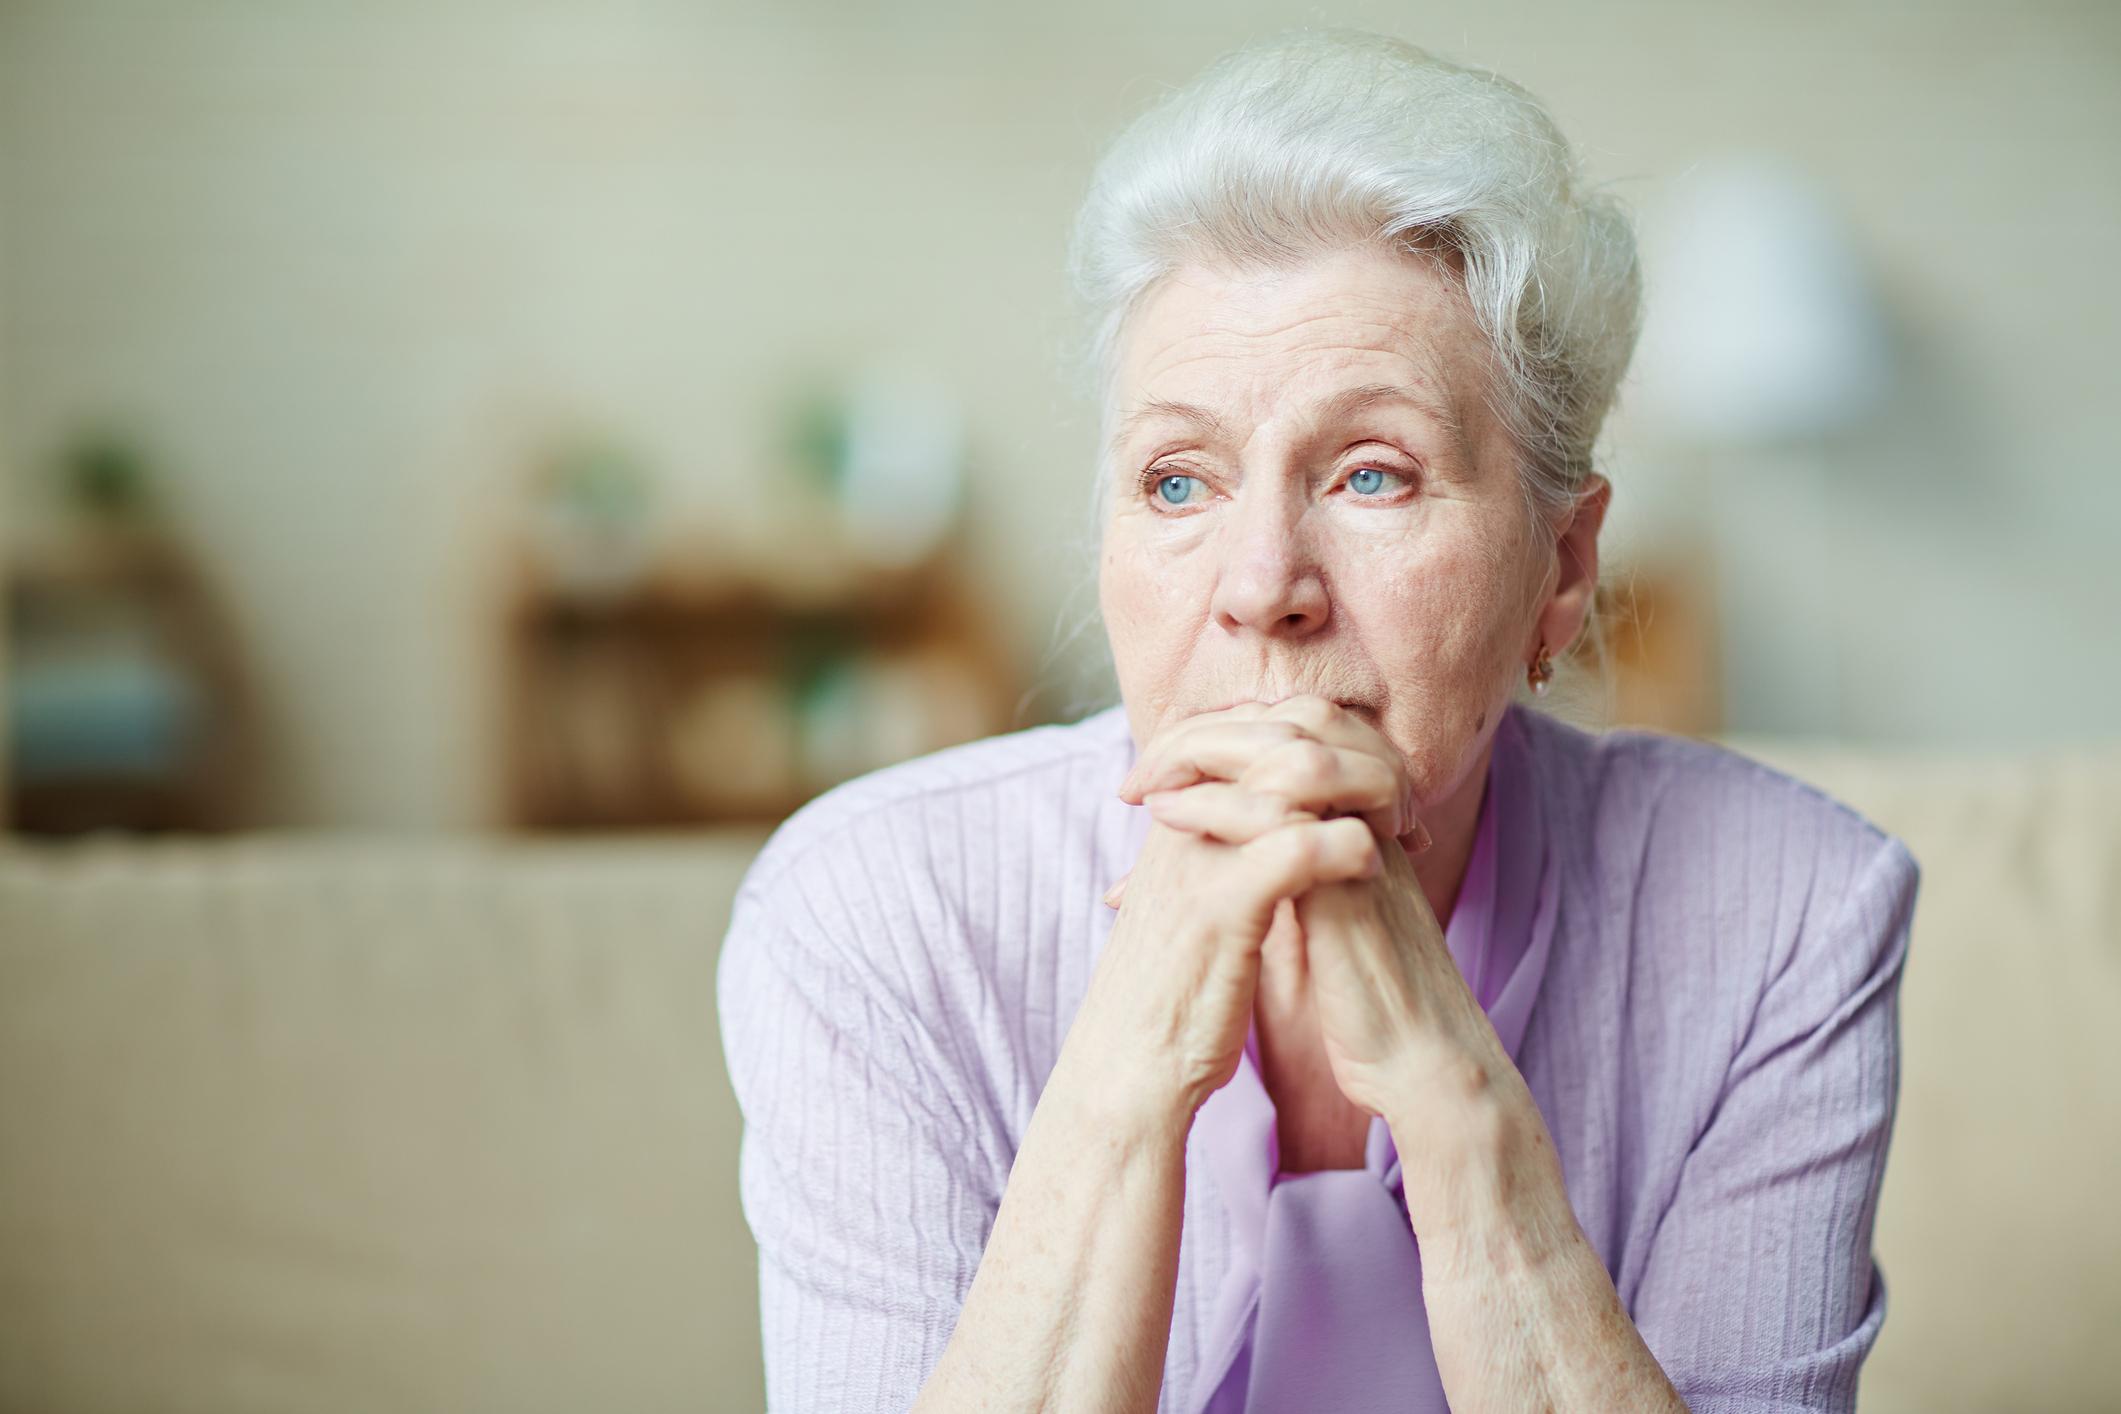 Got $0 in Retirement Savings? Here's Where to Start